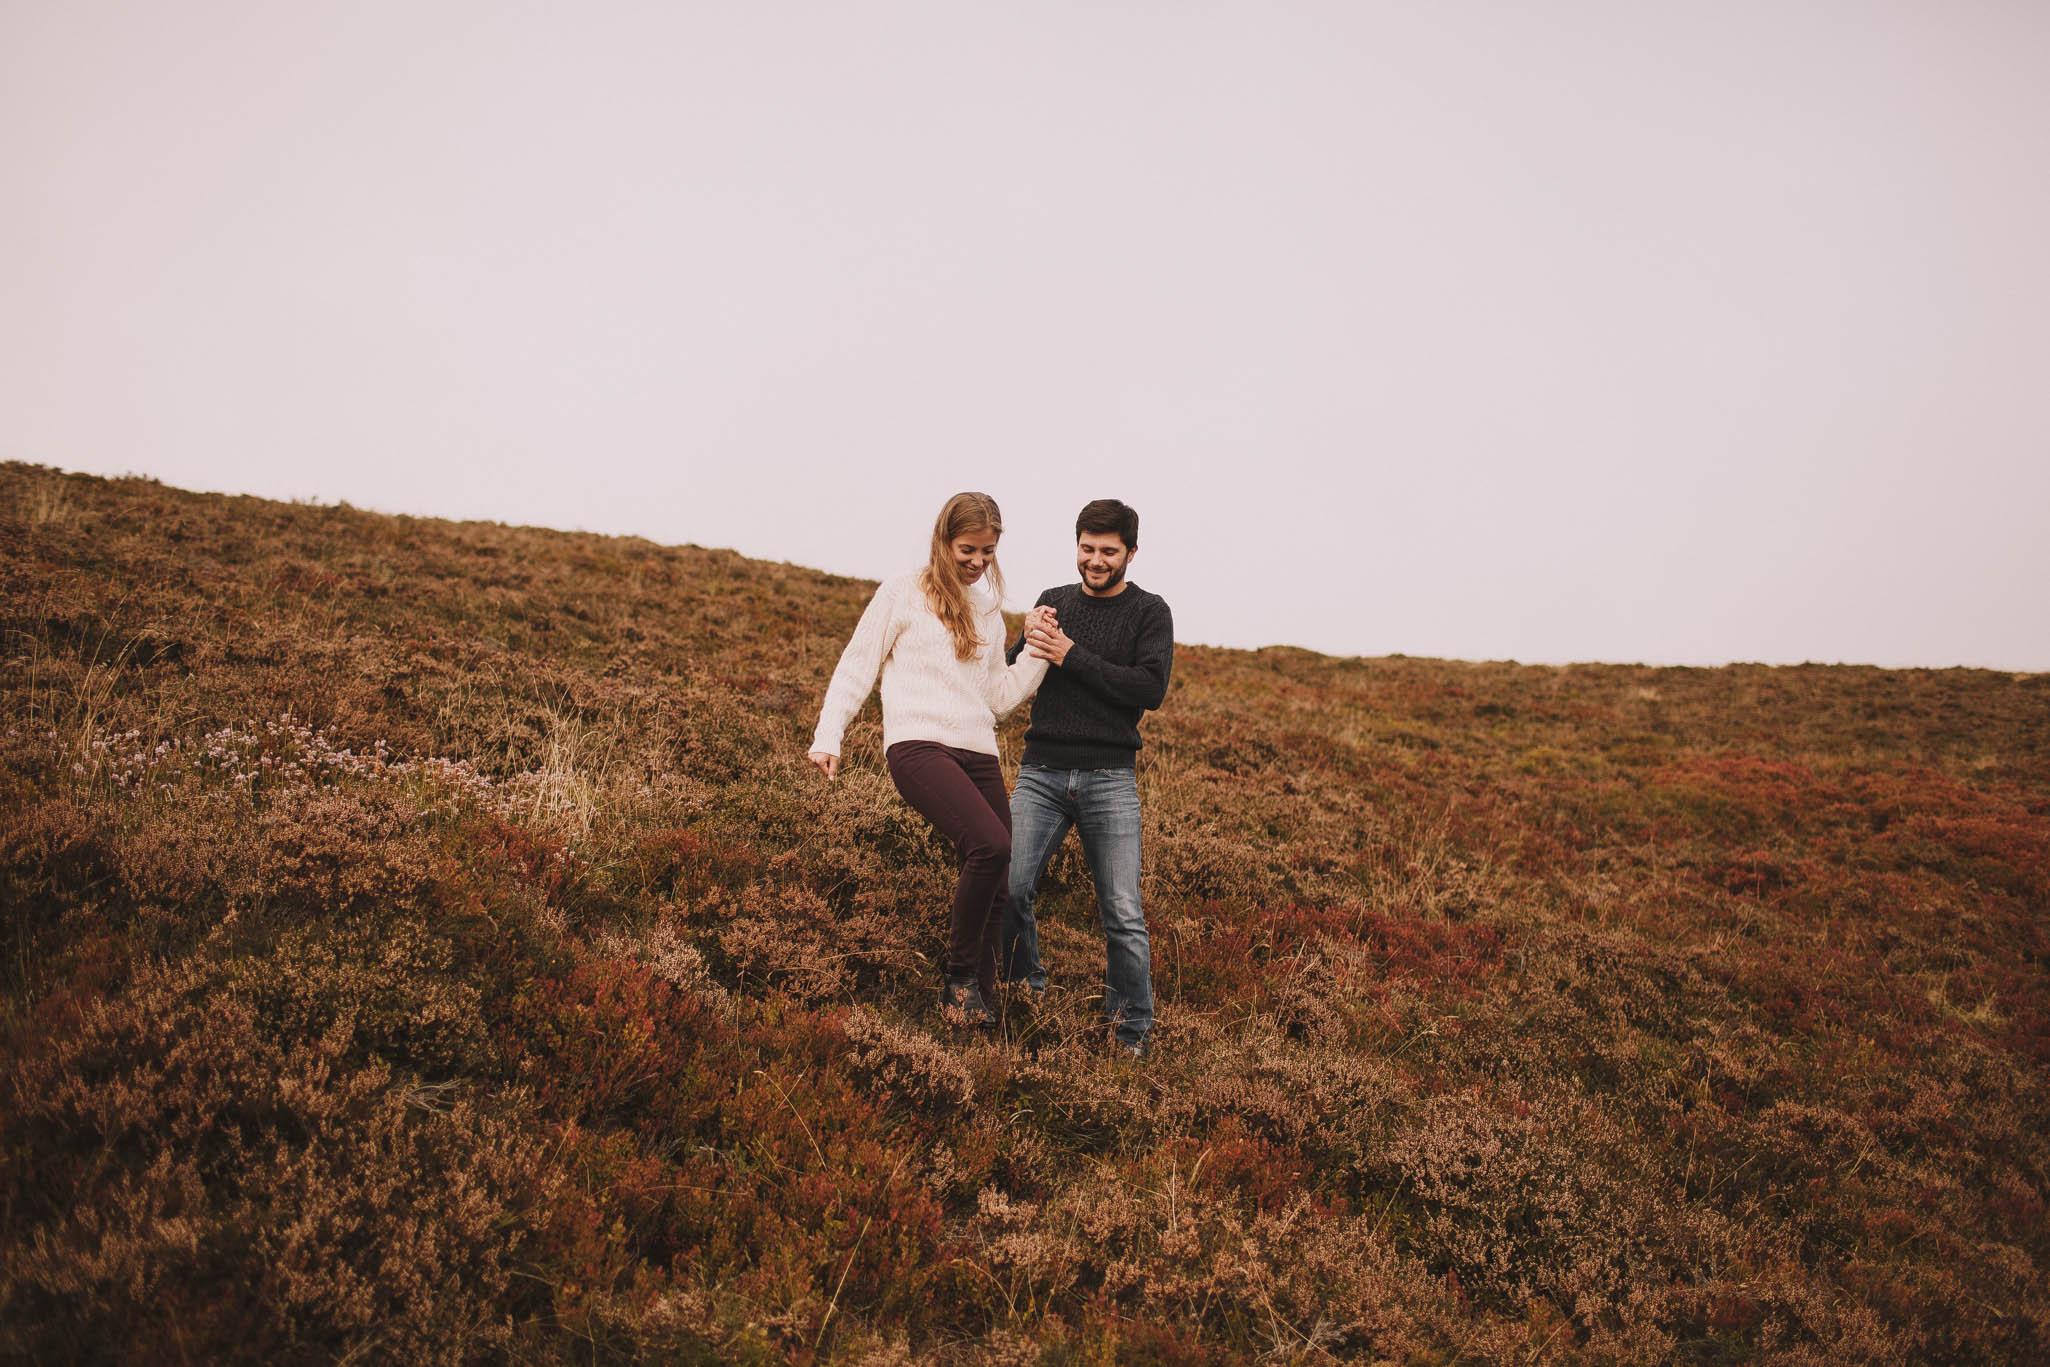 Pyrénées-mountains-wedding-photographer-jeremy-boyer-montagne-engagement-session-love-couple-12.jpg